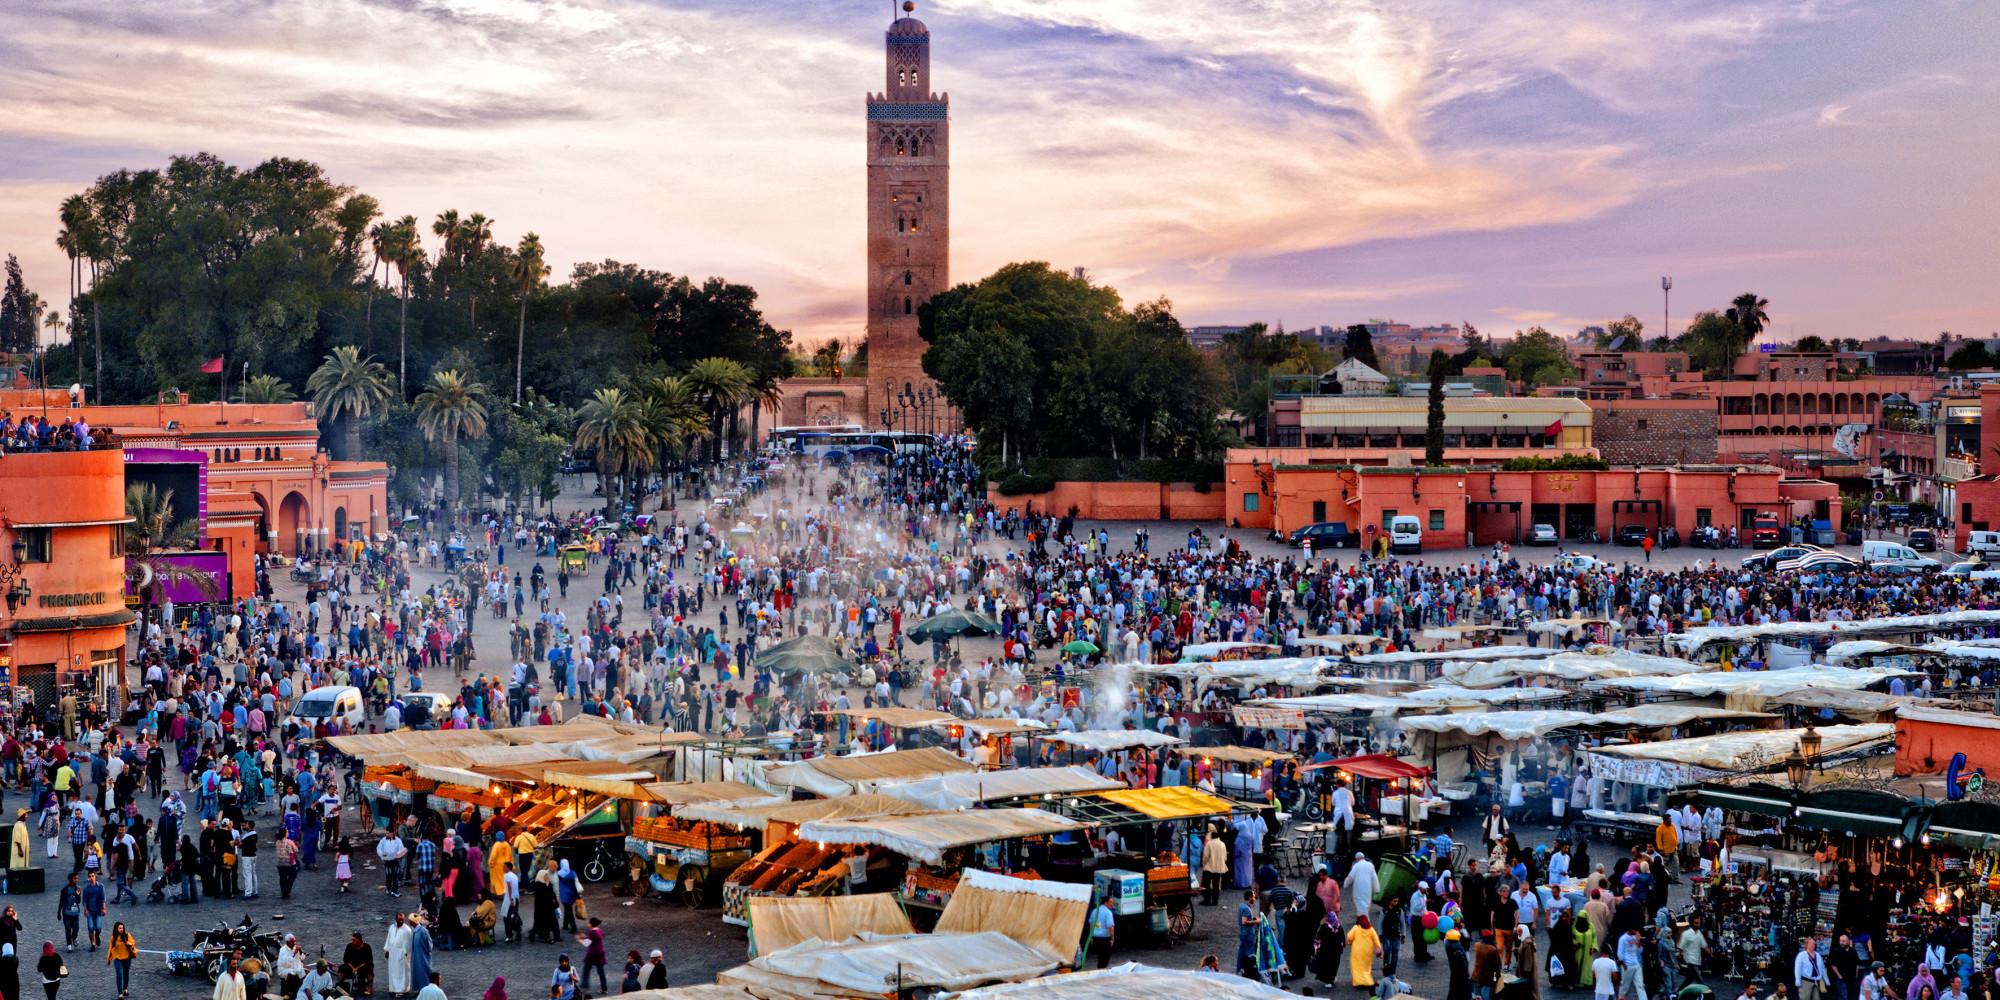 Marrakech Medina Guided Tours